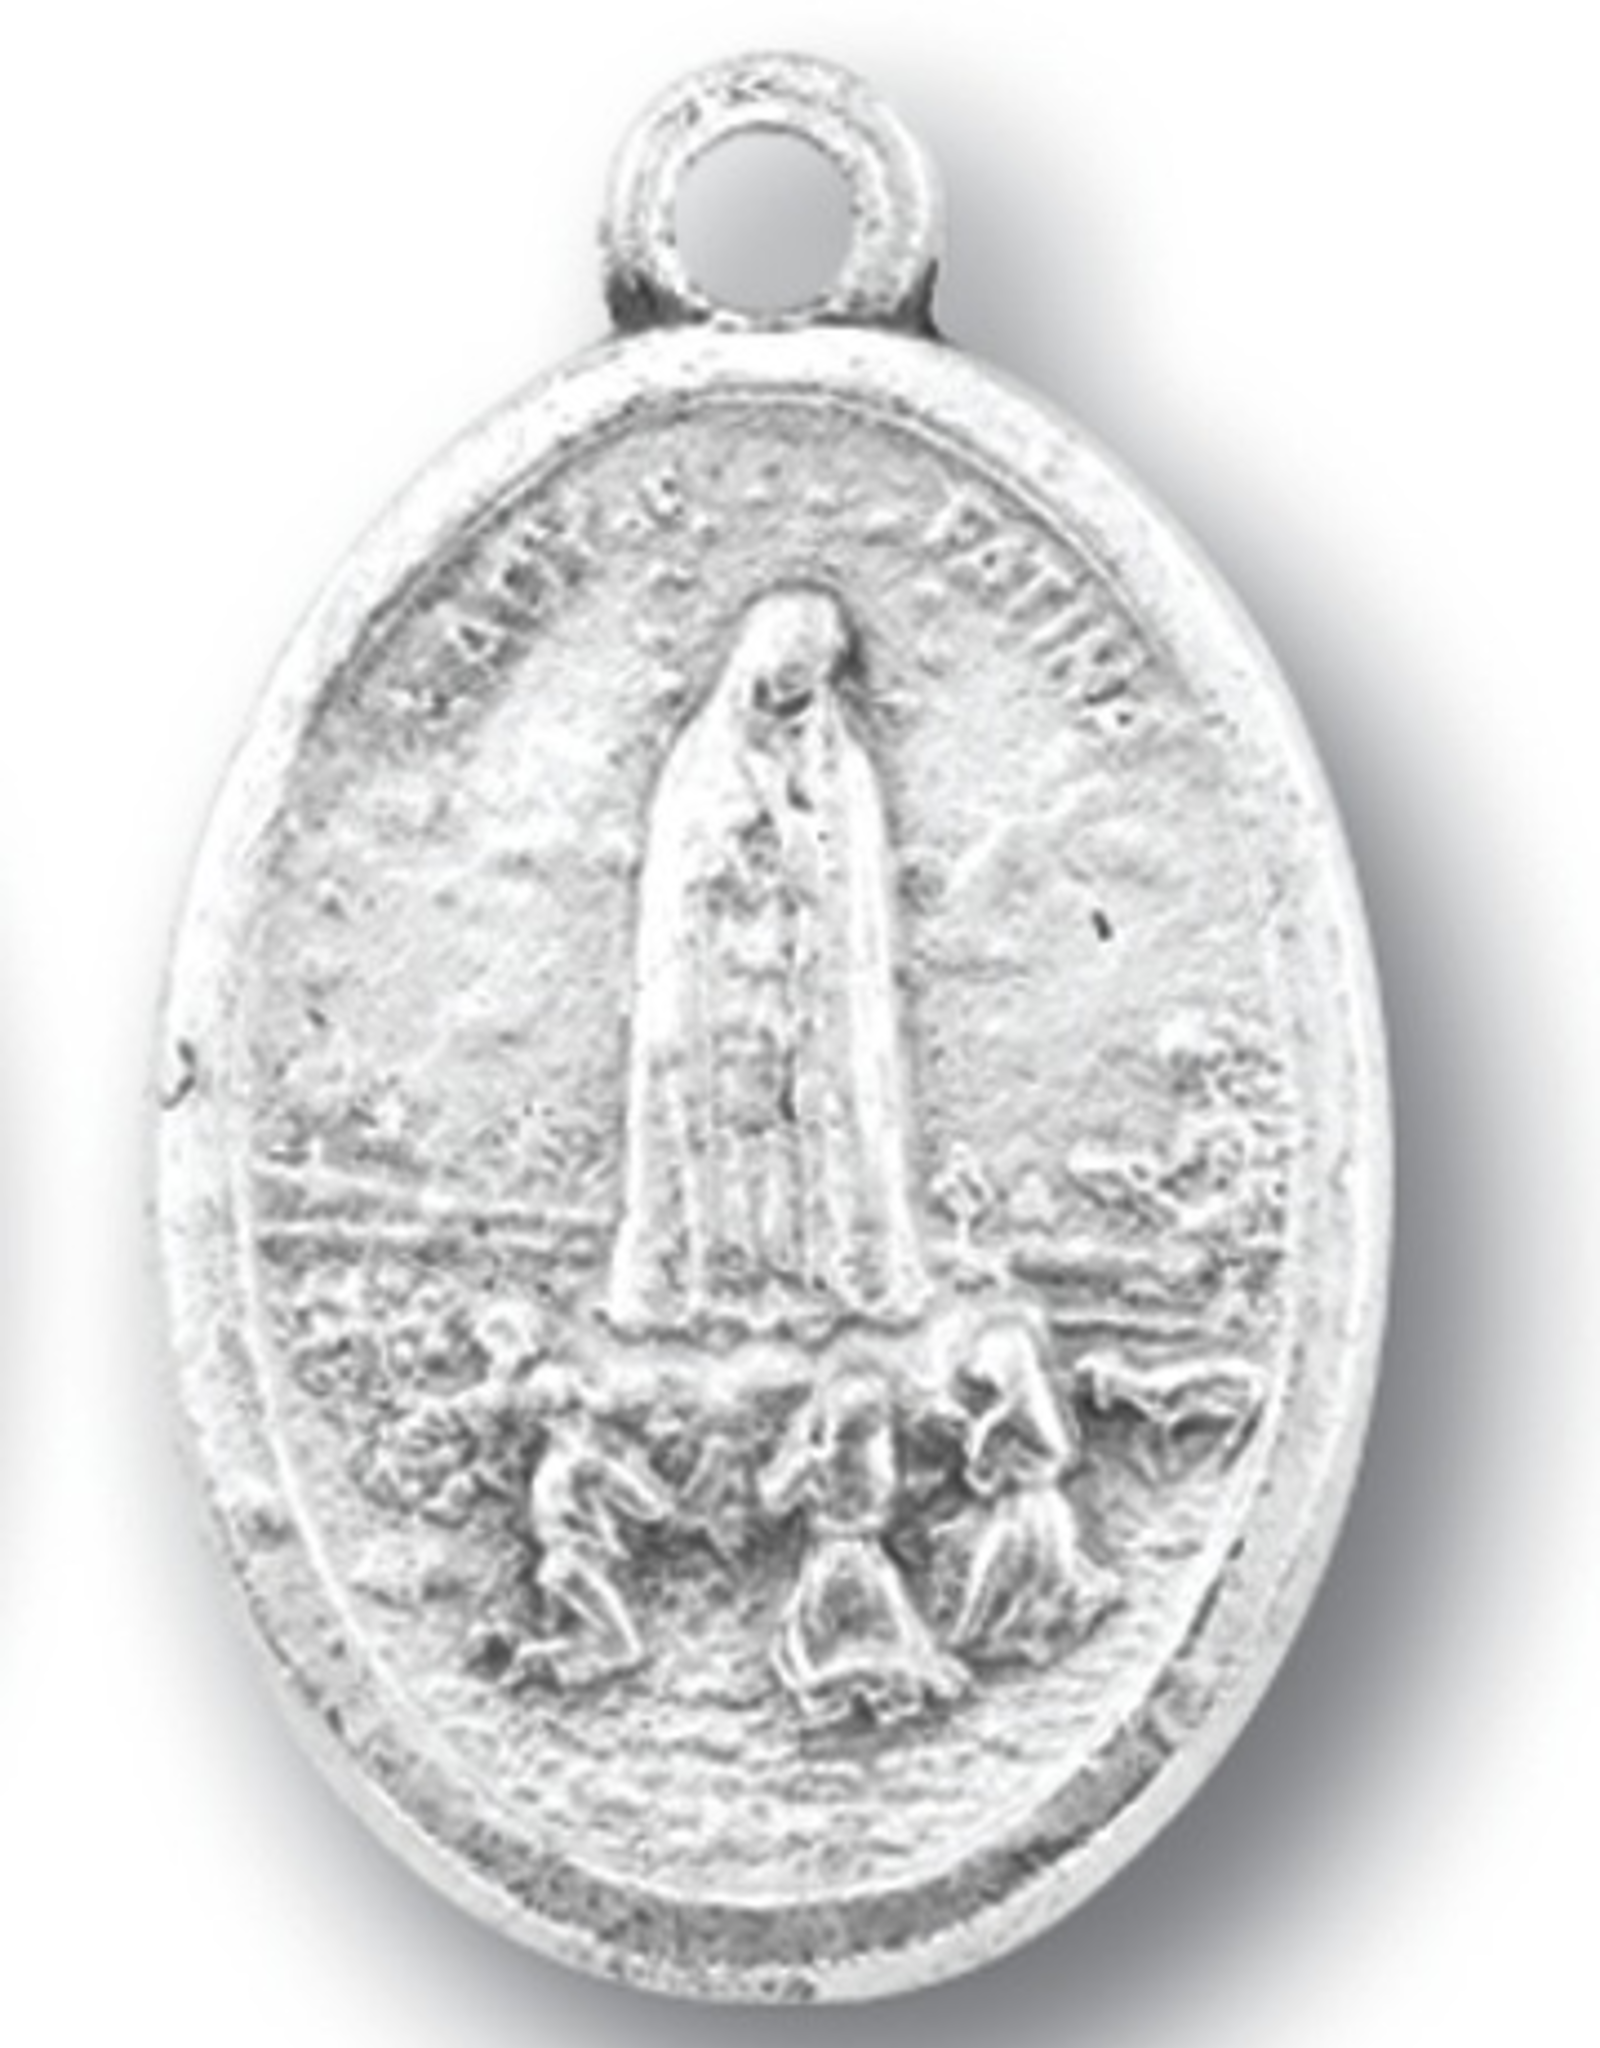 WJ Hirten Our Lady of Fatima Medal